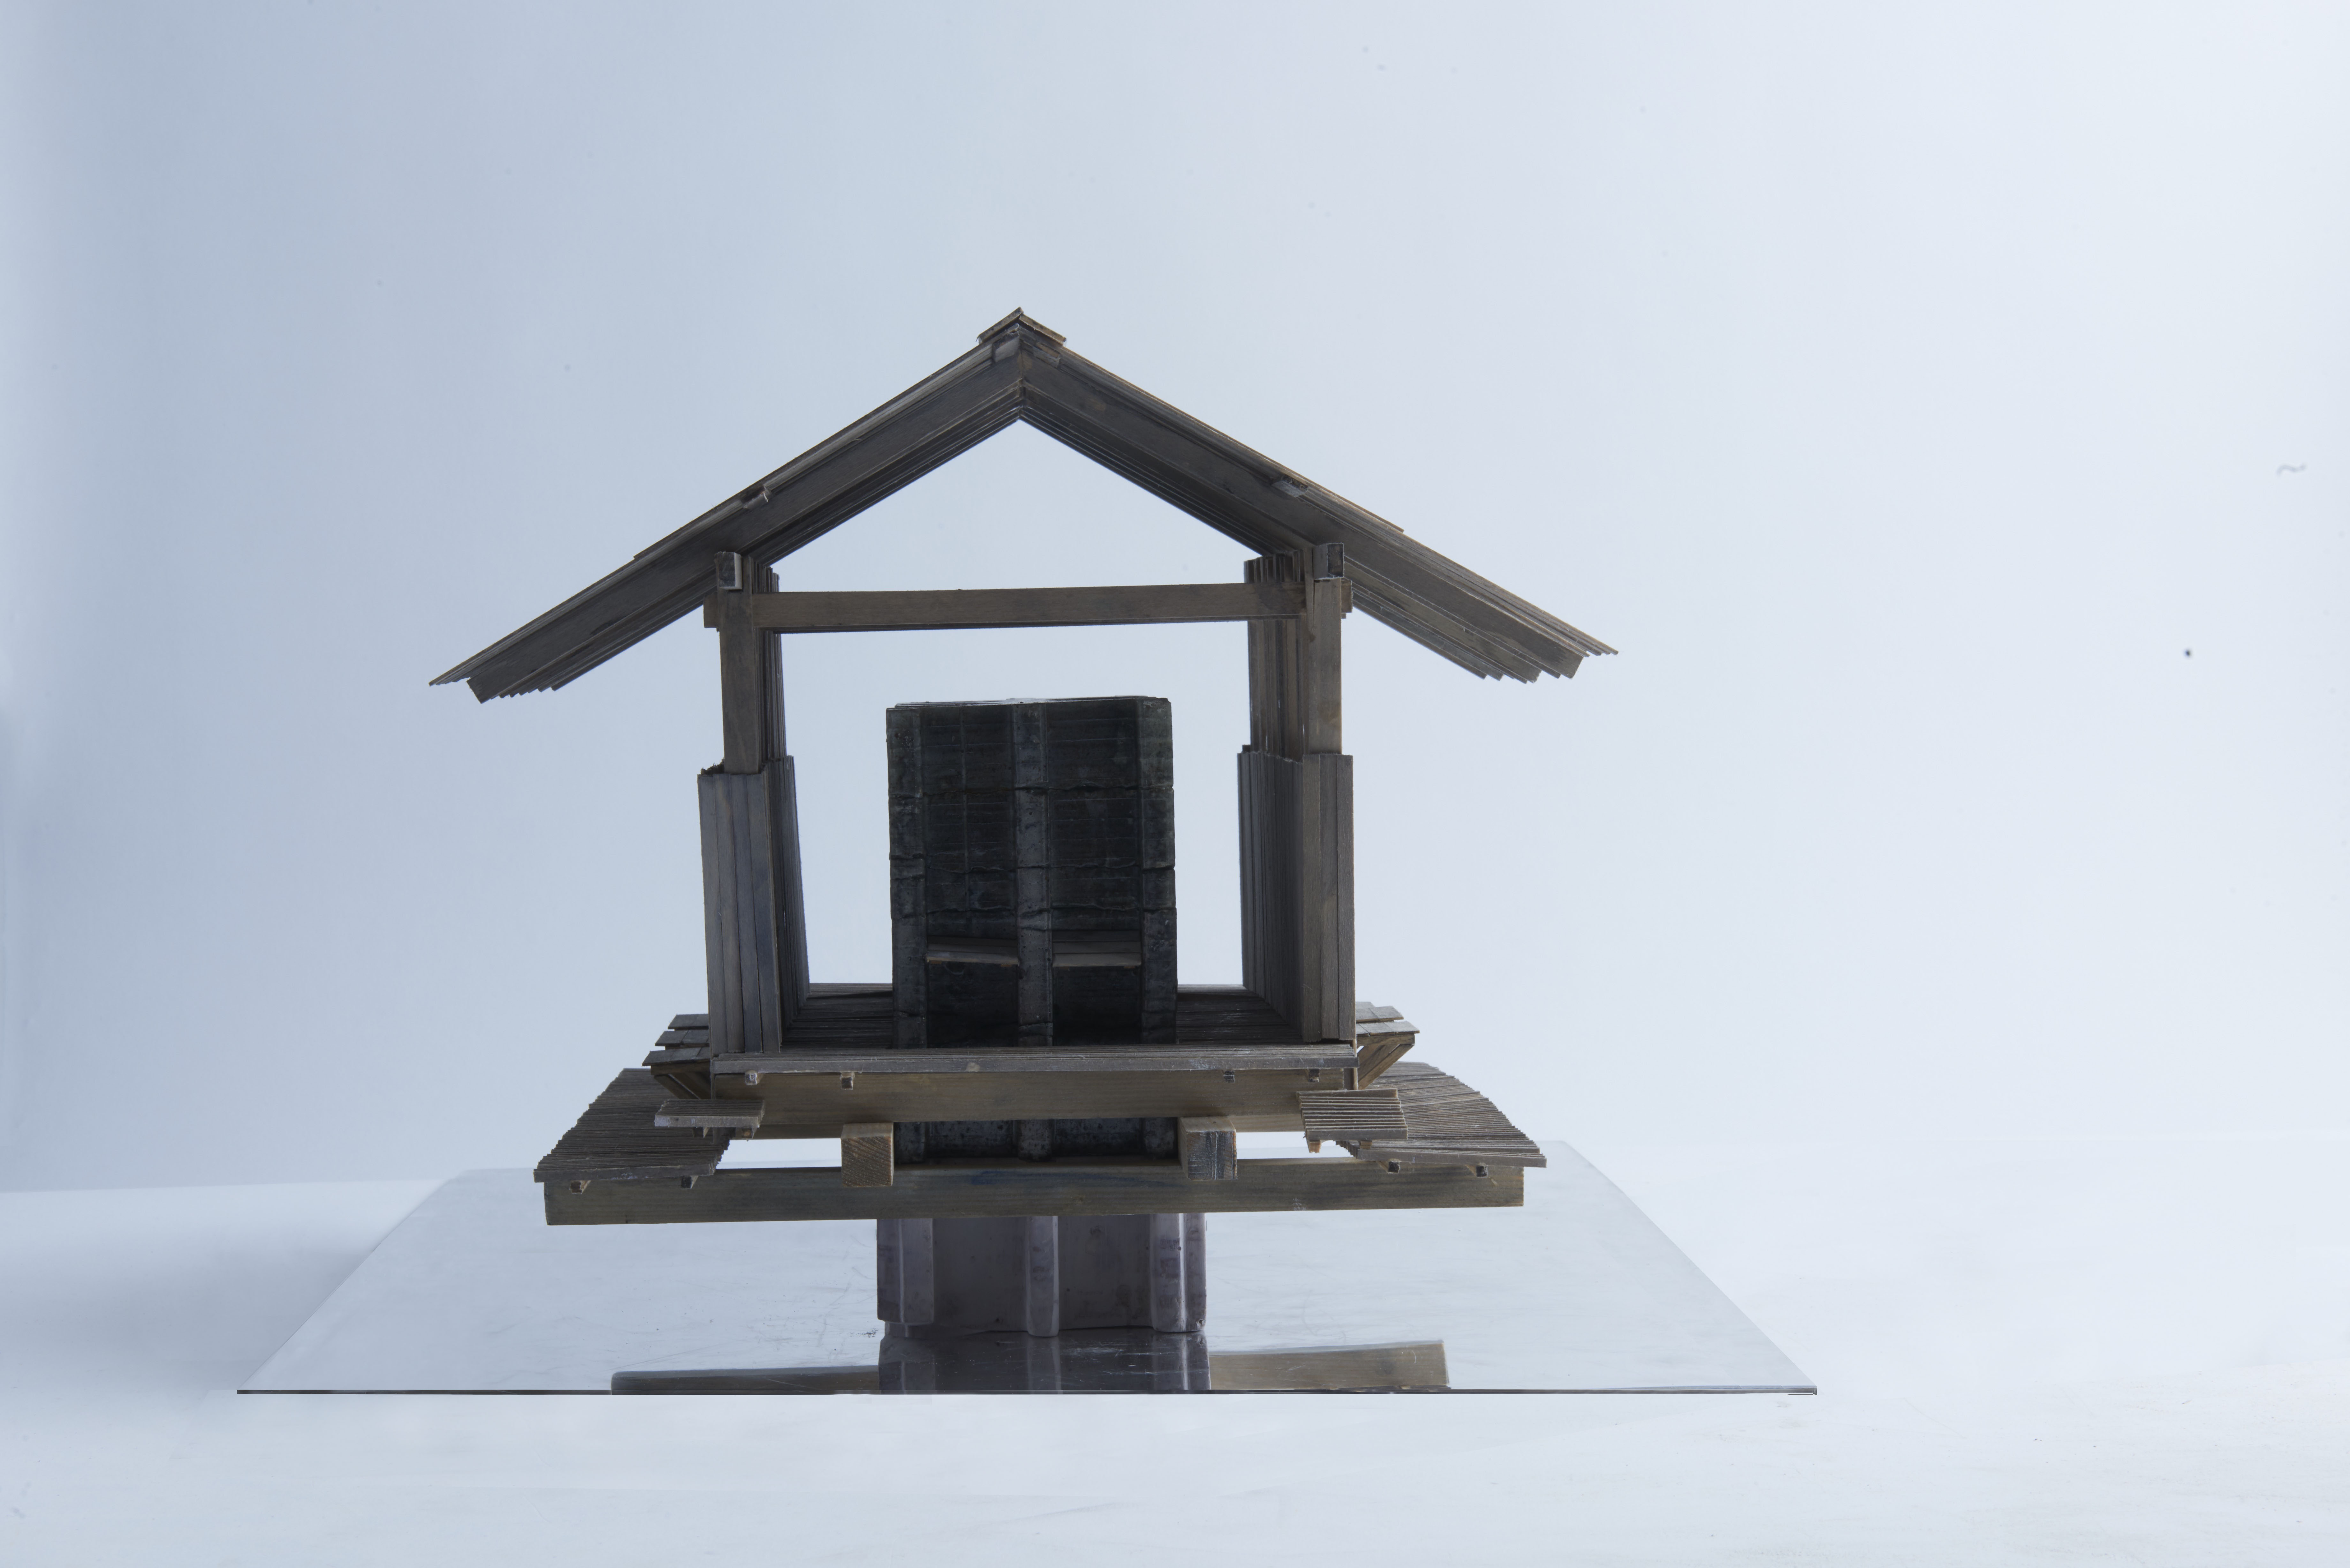 showerhouse arkitektur architecture kallbad winter bathhouse graduate thesis model